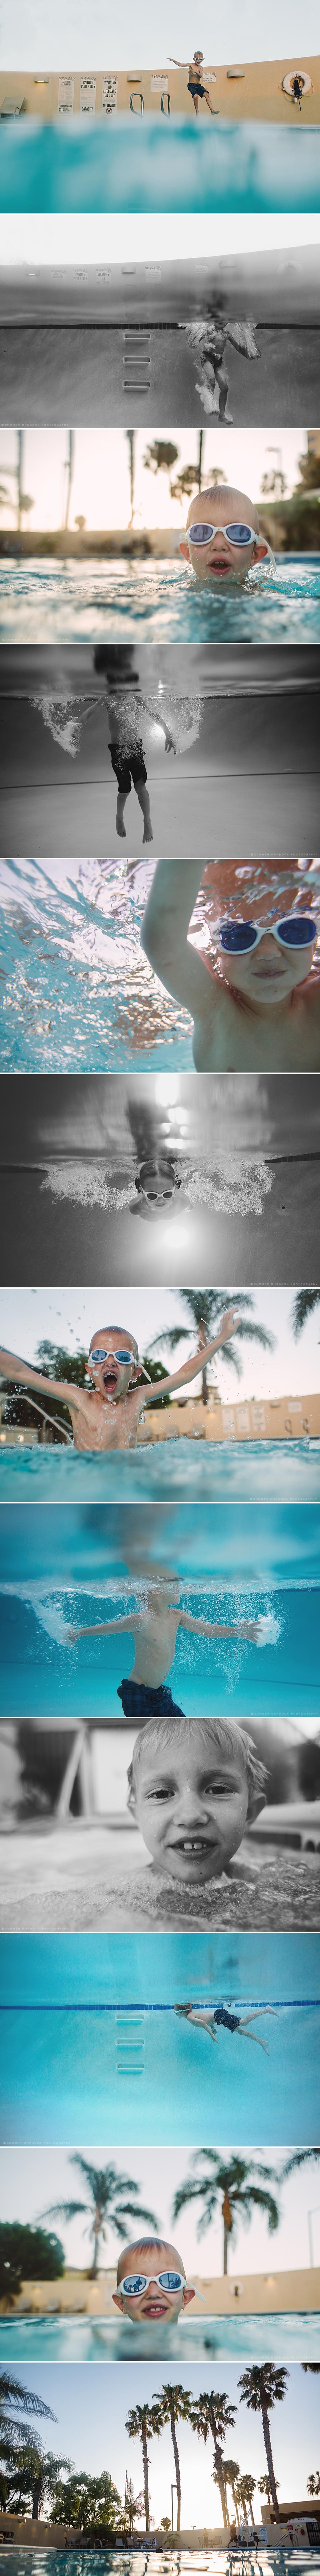 Summer Murdock Photography | Salt Lake City Photographer | Underwater Photography